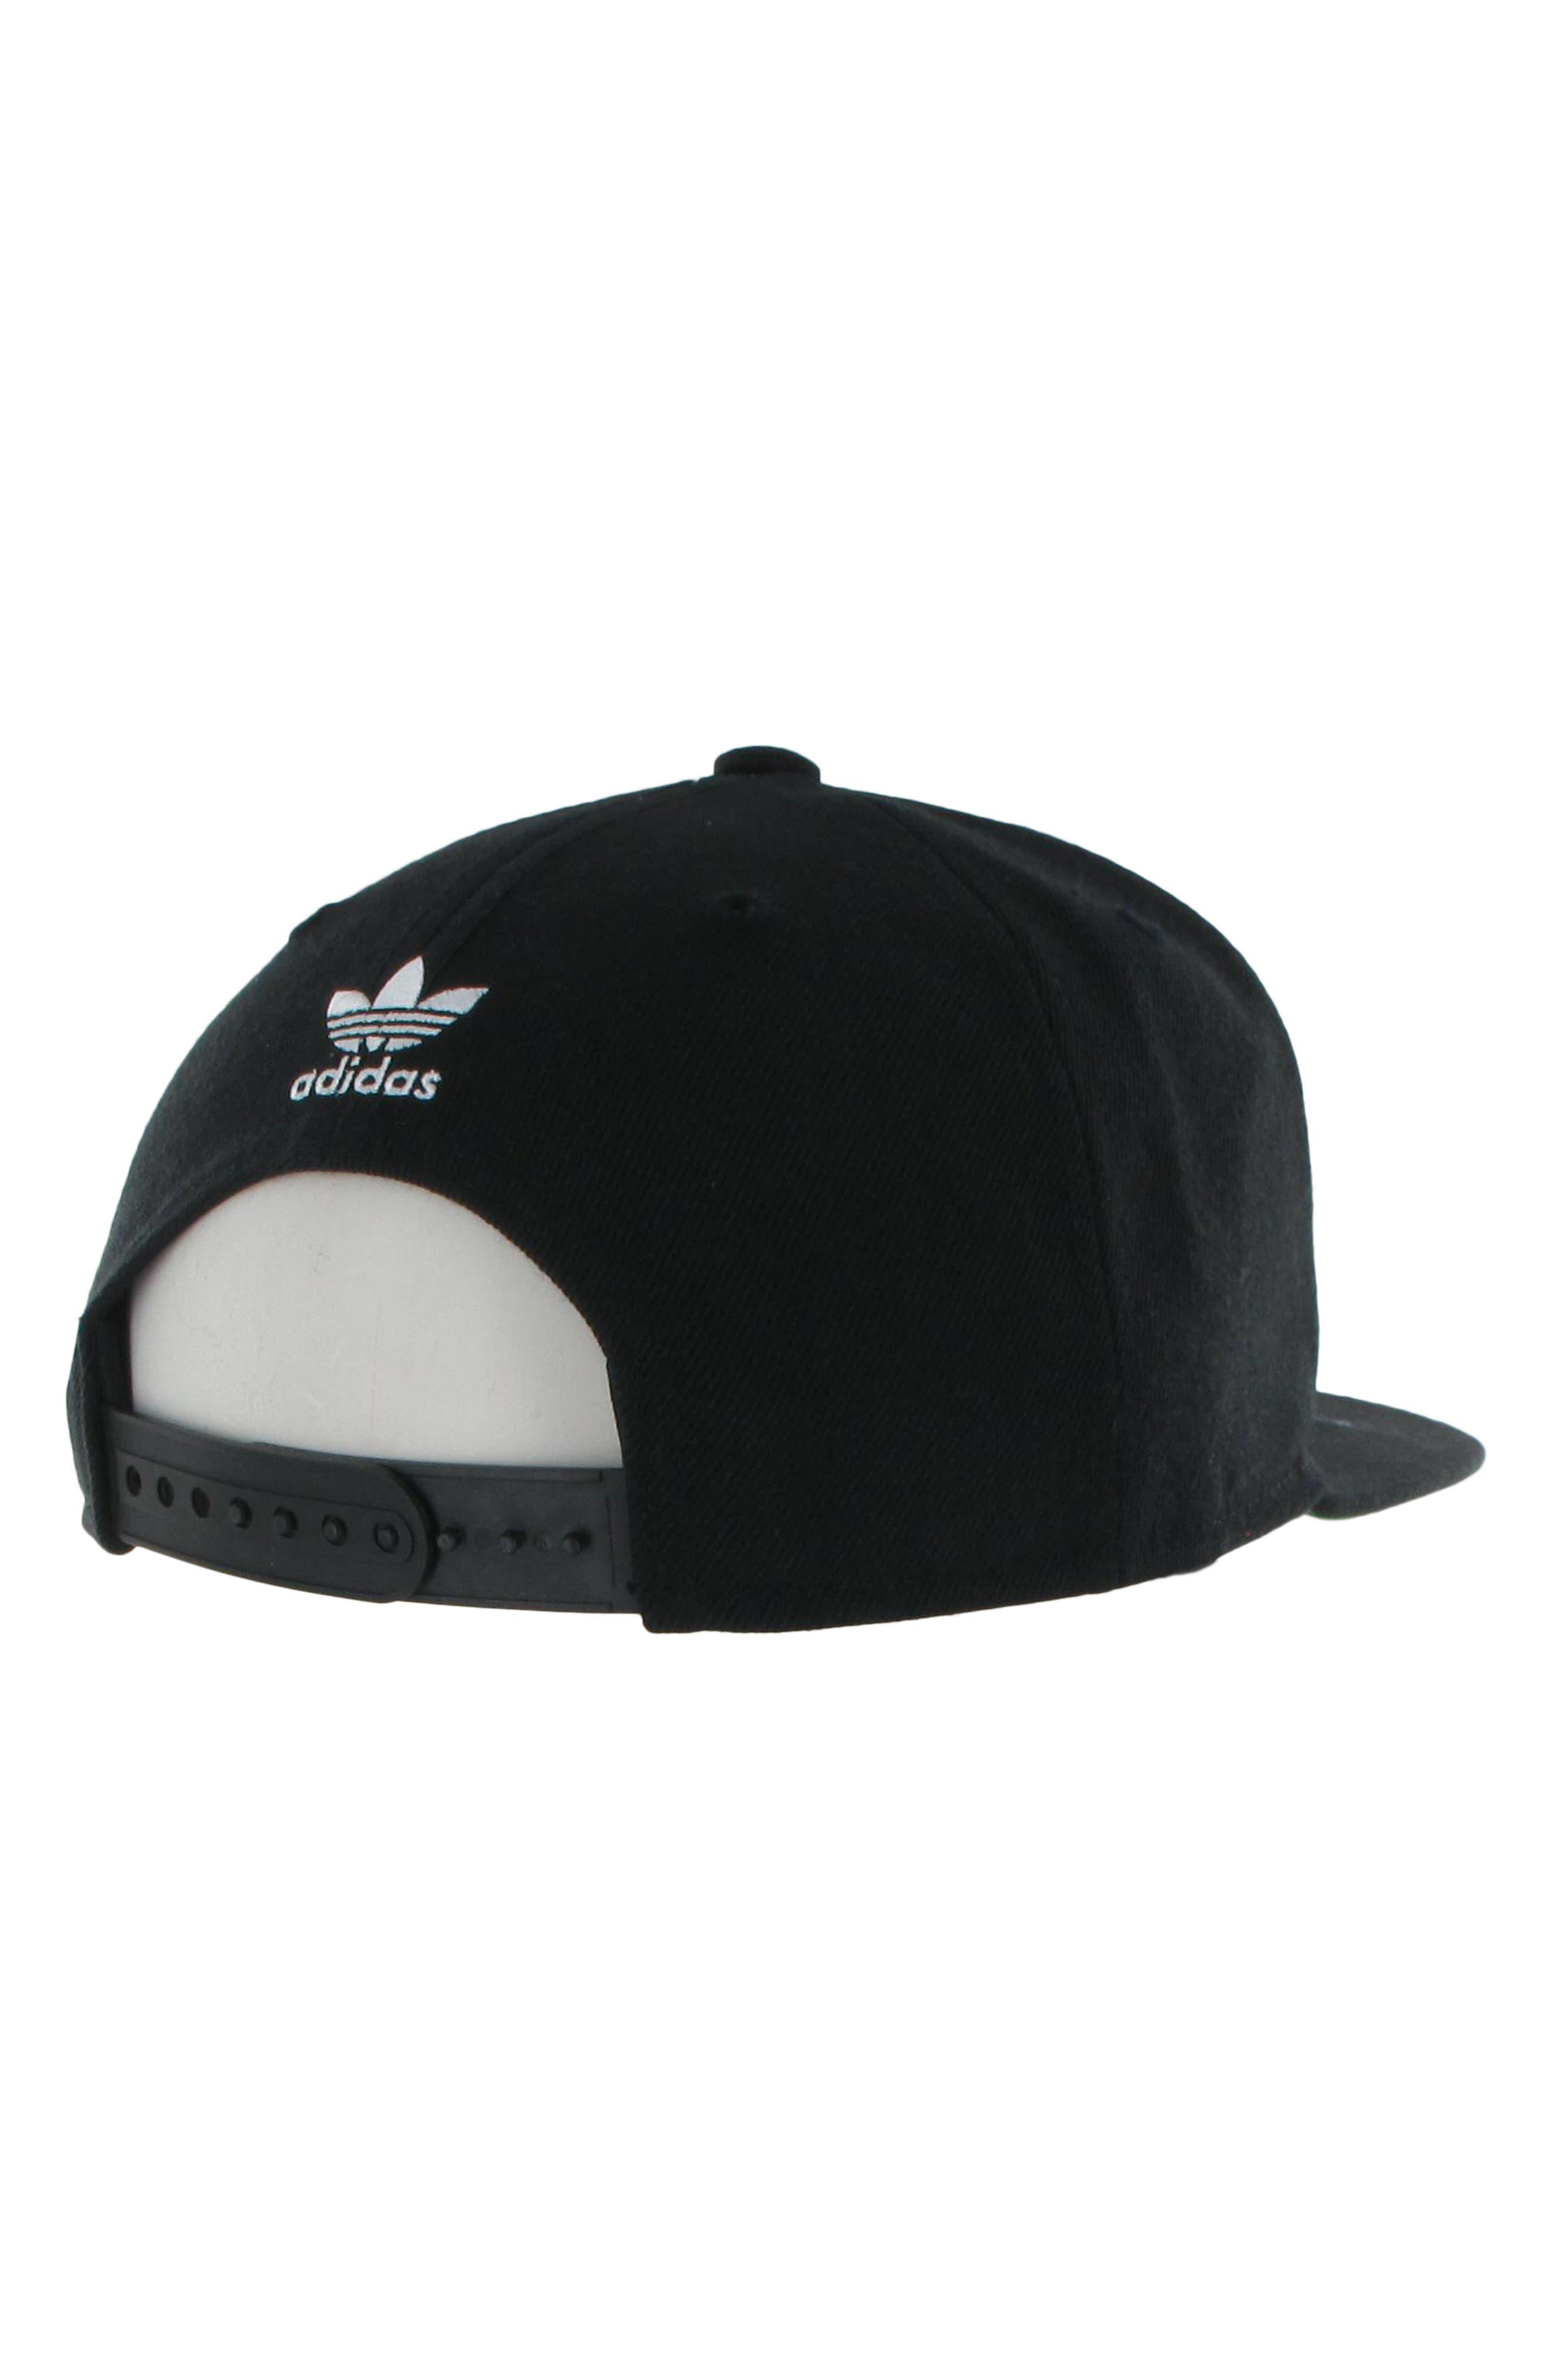 Originals Snapback Hat,                             Alternate thumbnail 2, color,                             BLACK/ WHITE